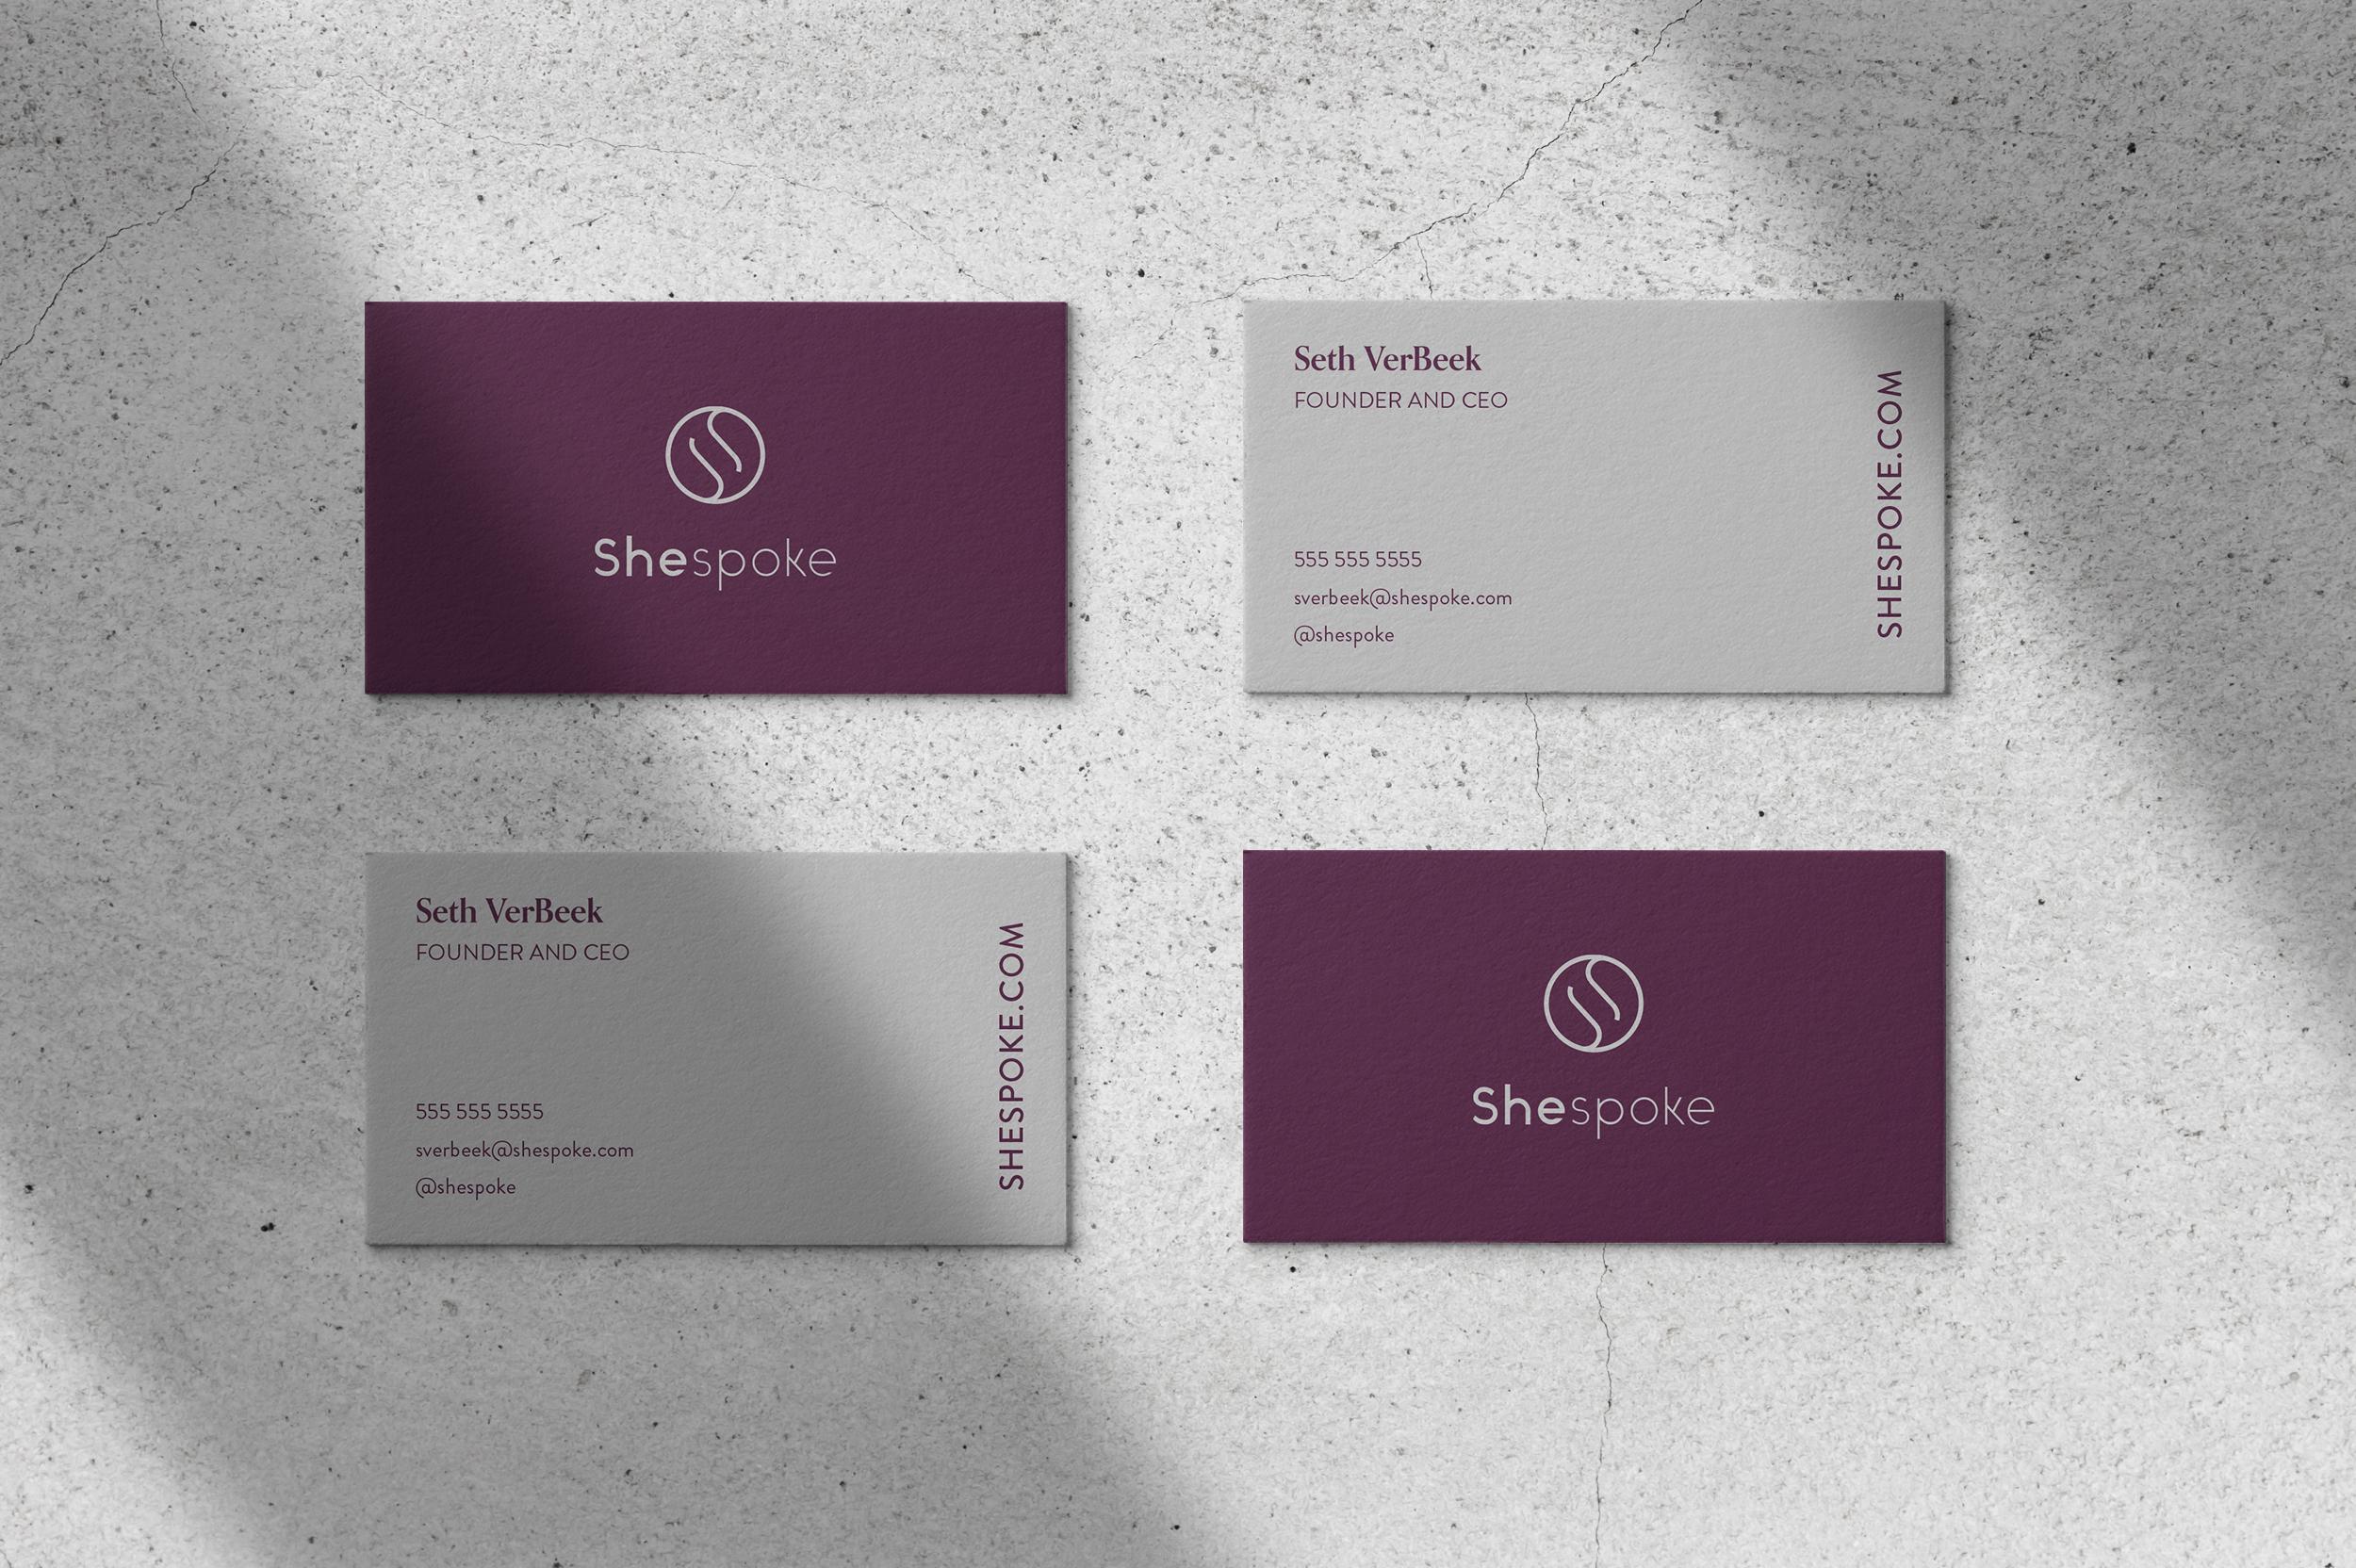 Shespoke Business Cards